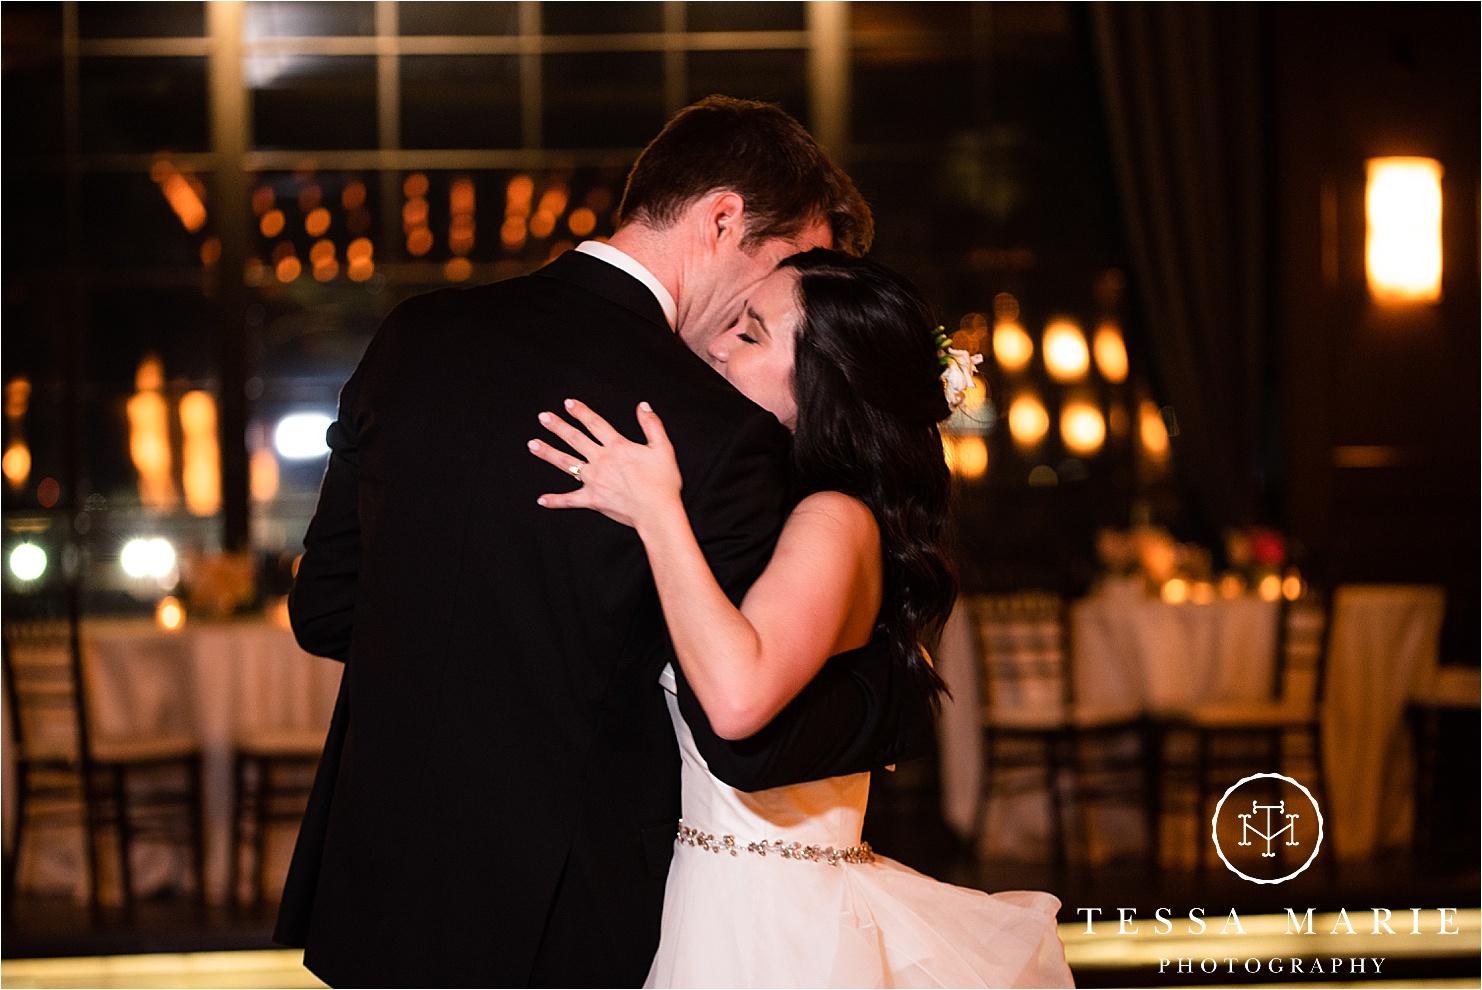 Tessa_marie_weddings_houston_wedding_photographer_The_astorian_0186.jpg